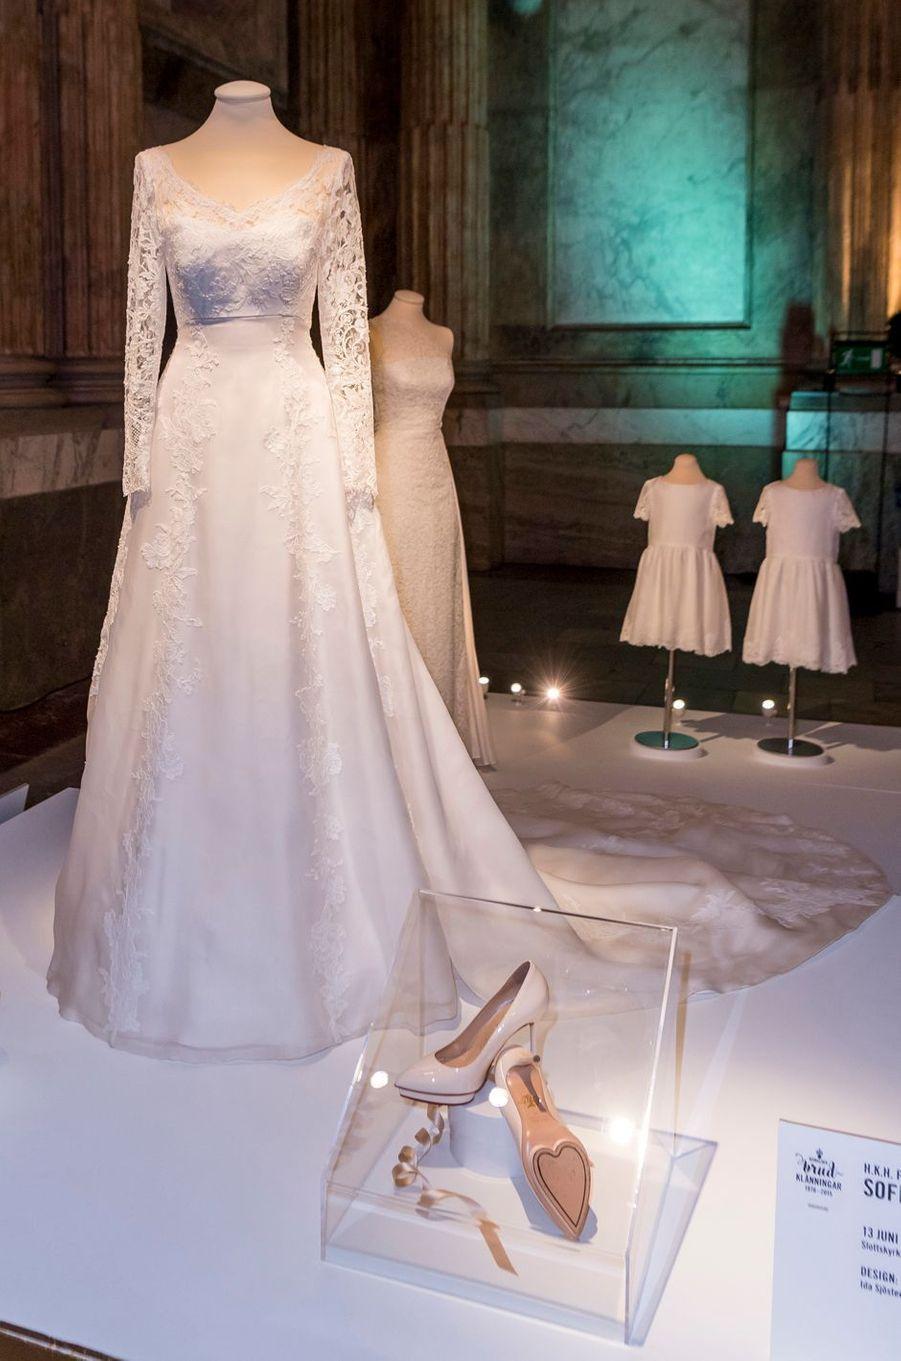 La robe de mariée de Sofia Hellqvist, exposée à Stockholm, le 17 octobre 2016